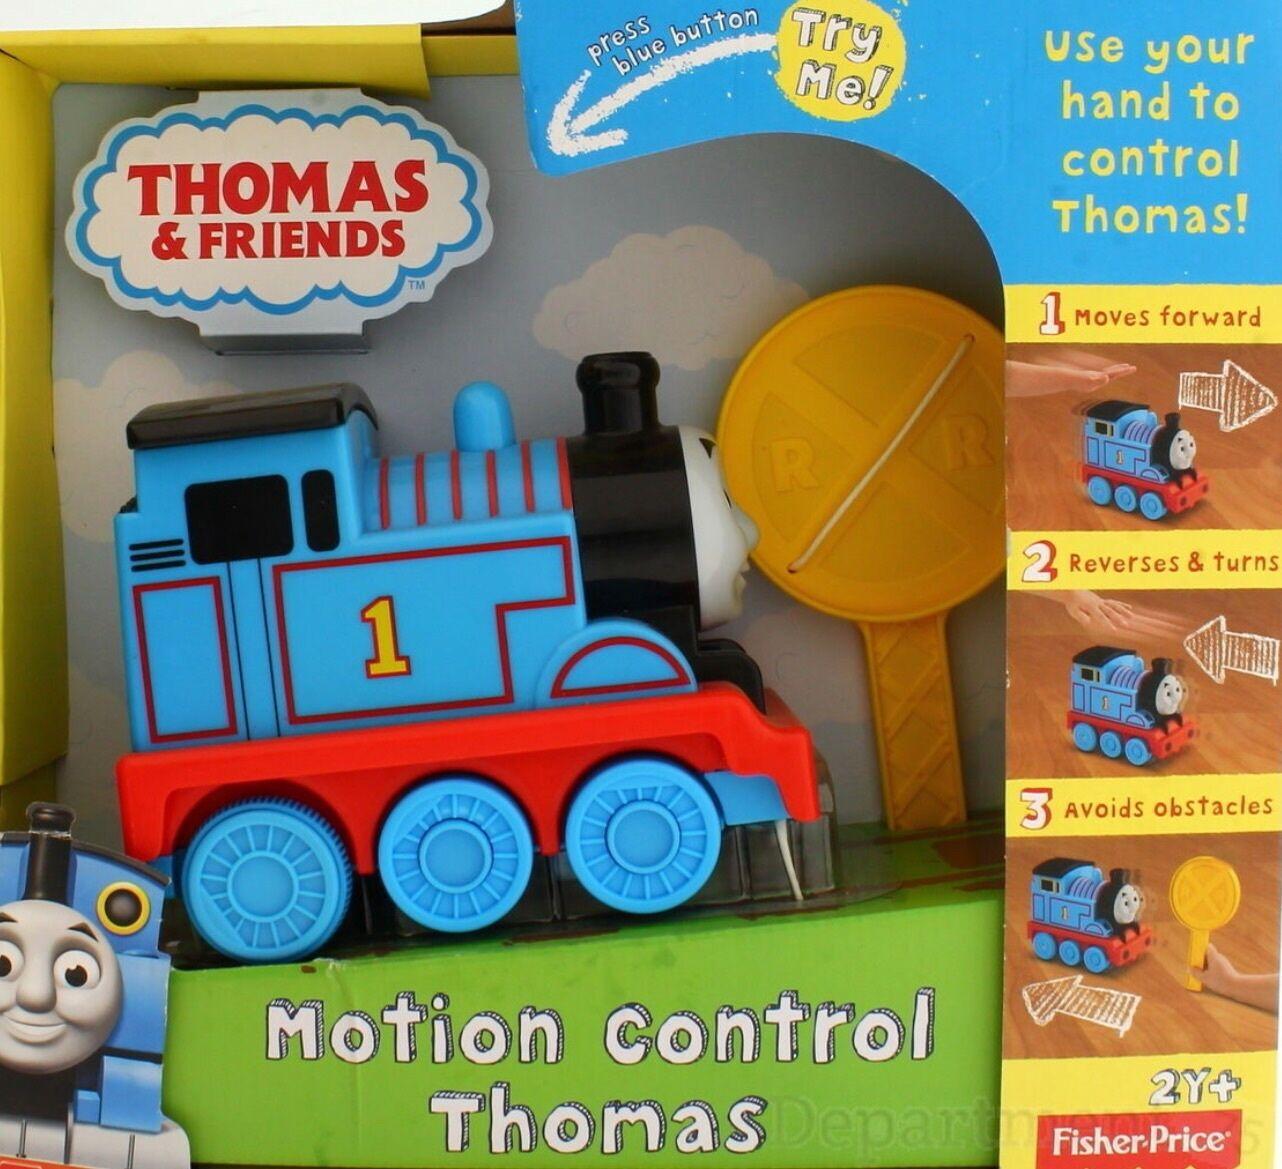 THOMAS & FRIENDS MOTION CONTROL THOMAS THE TRAIN YOU CONTROL CONTROL CONTROL 3f966f